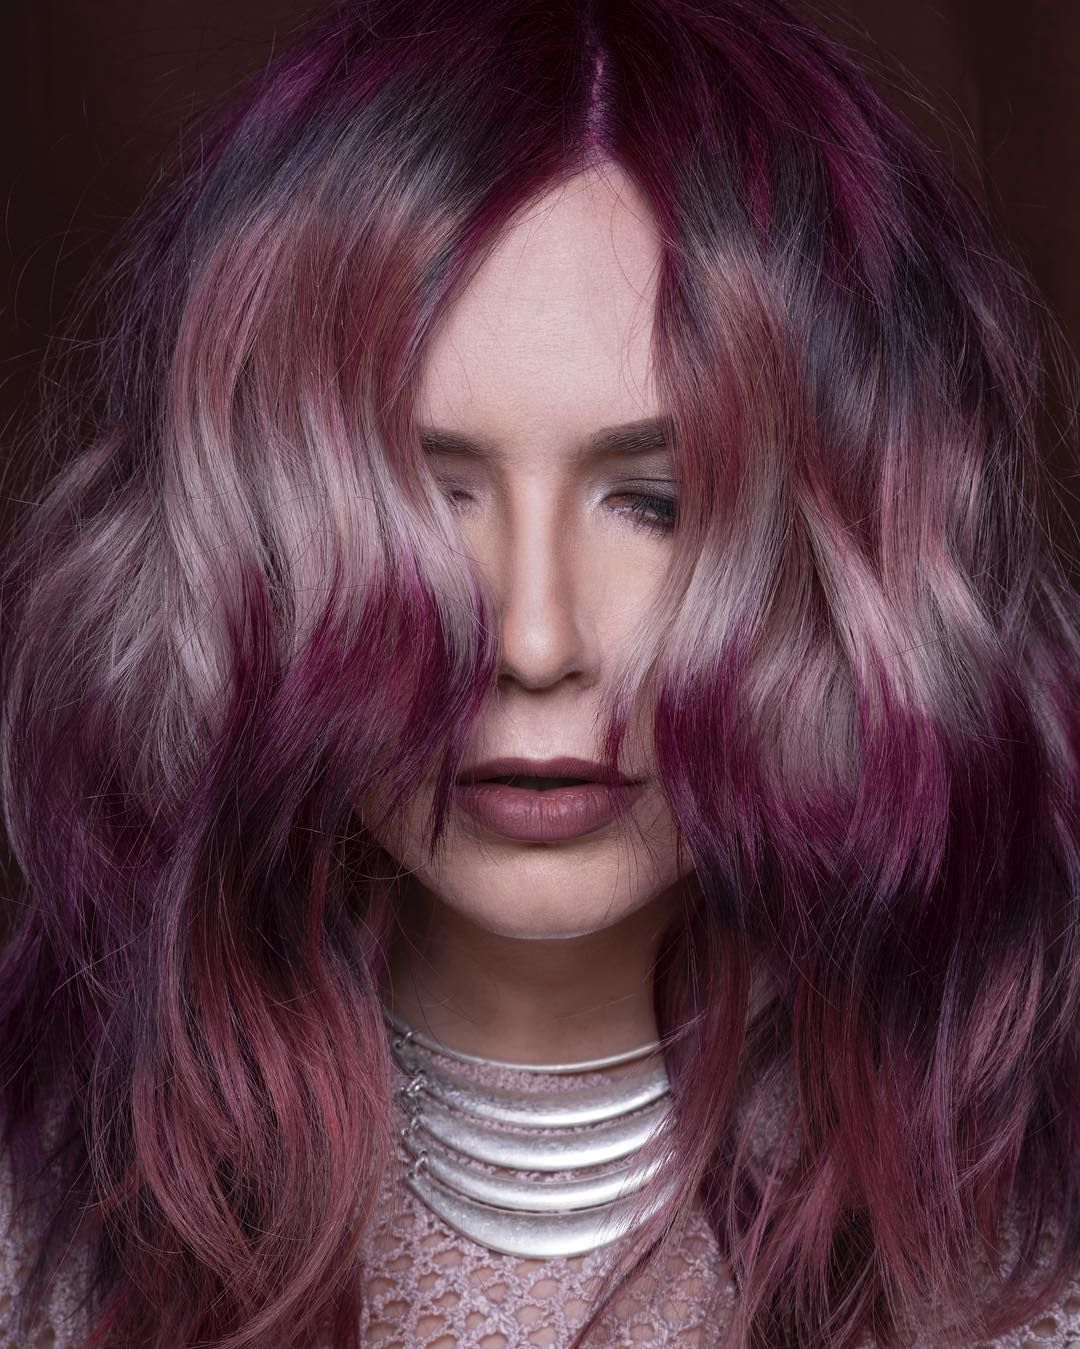 Desert Rose Hair Is The Prettiest New Hair Color Trend On Instagram